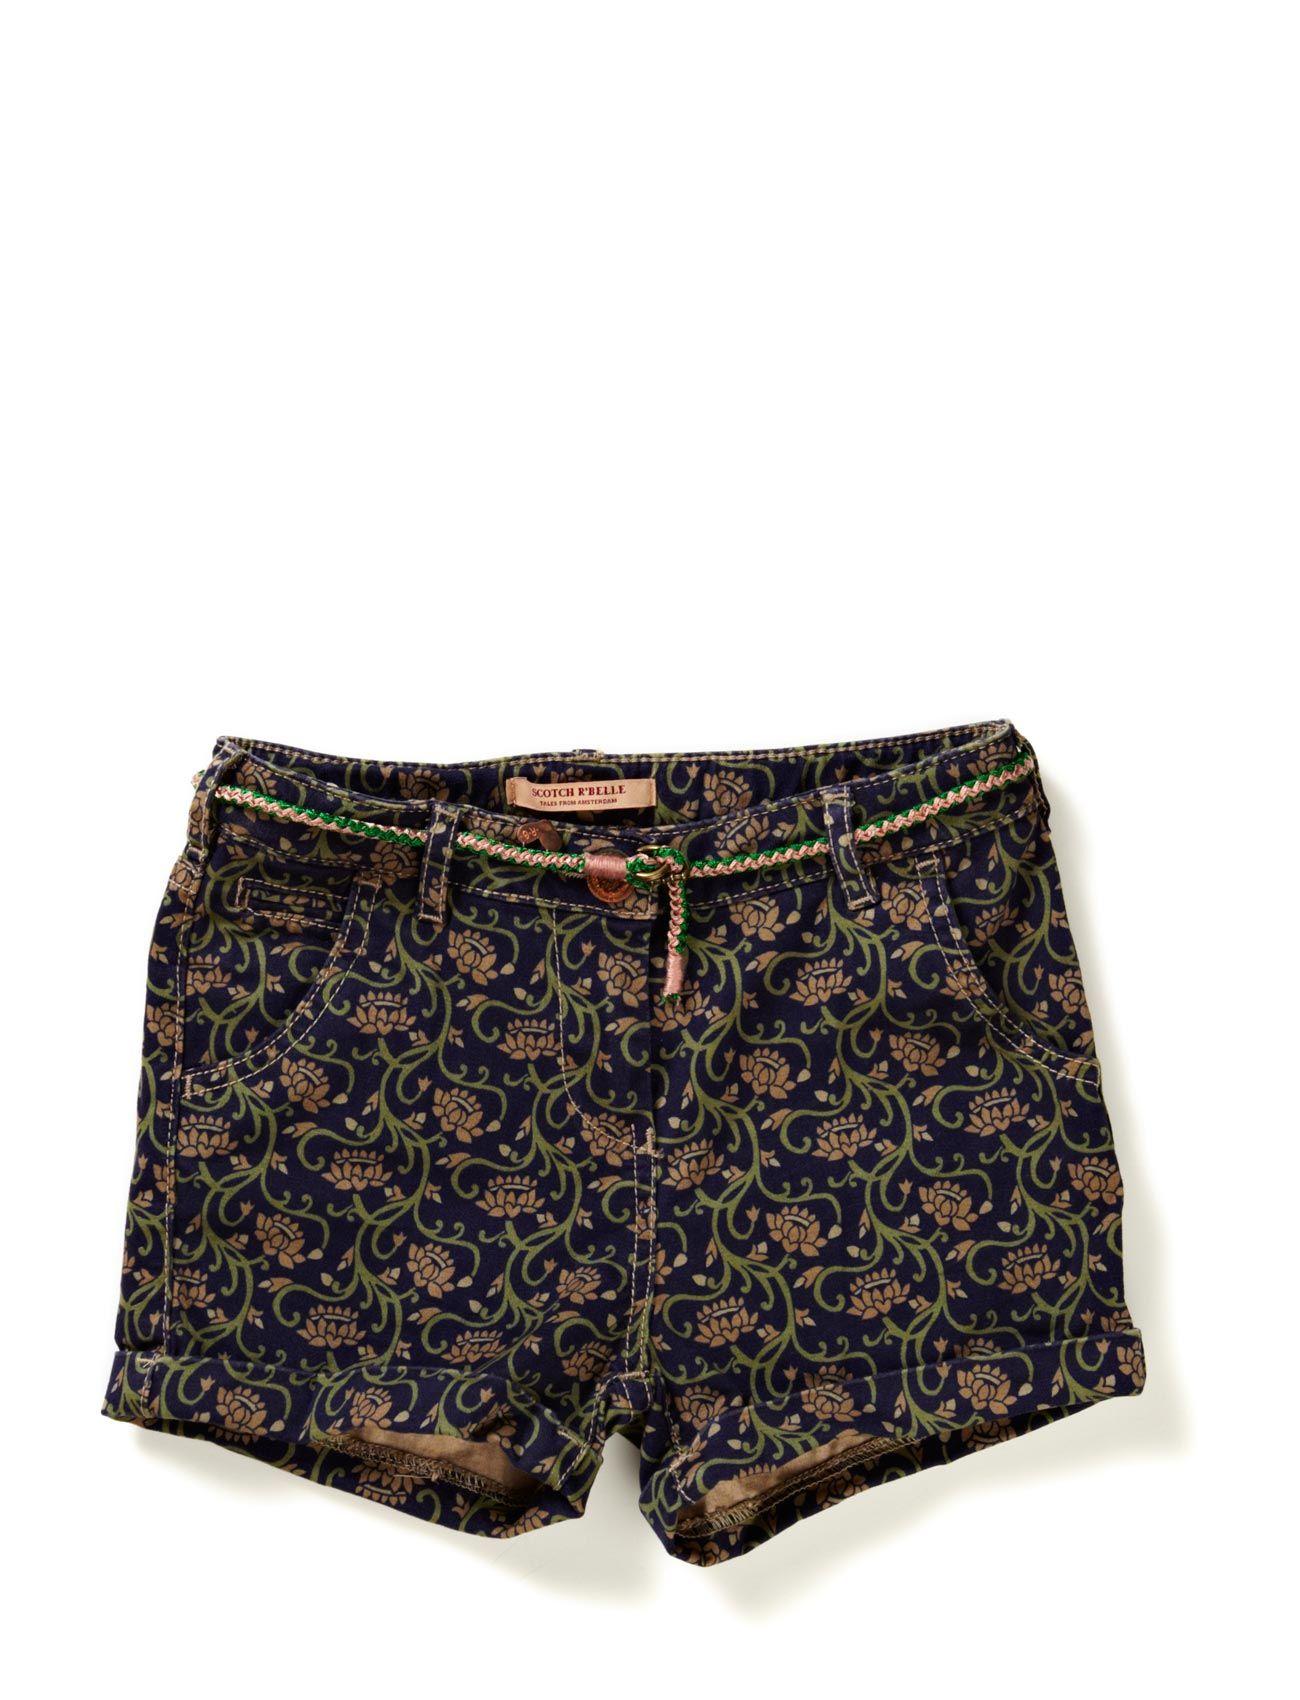 Boyfriend Fit Shorts + Belt